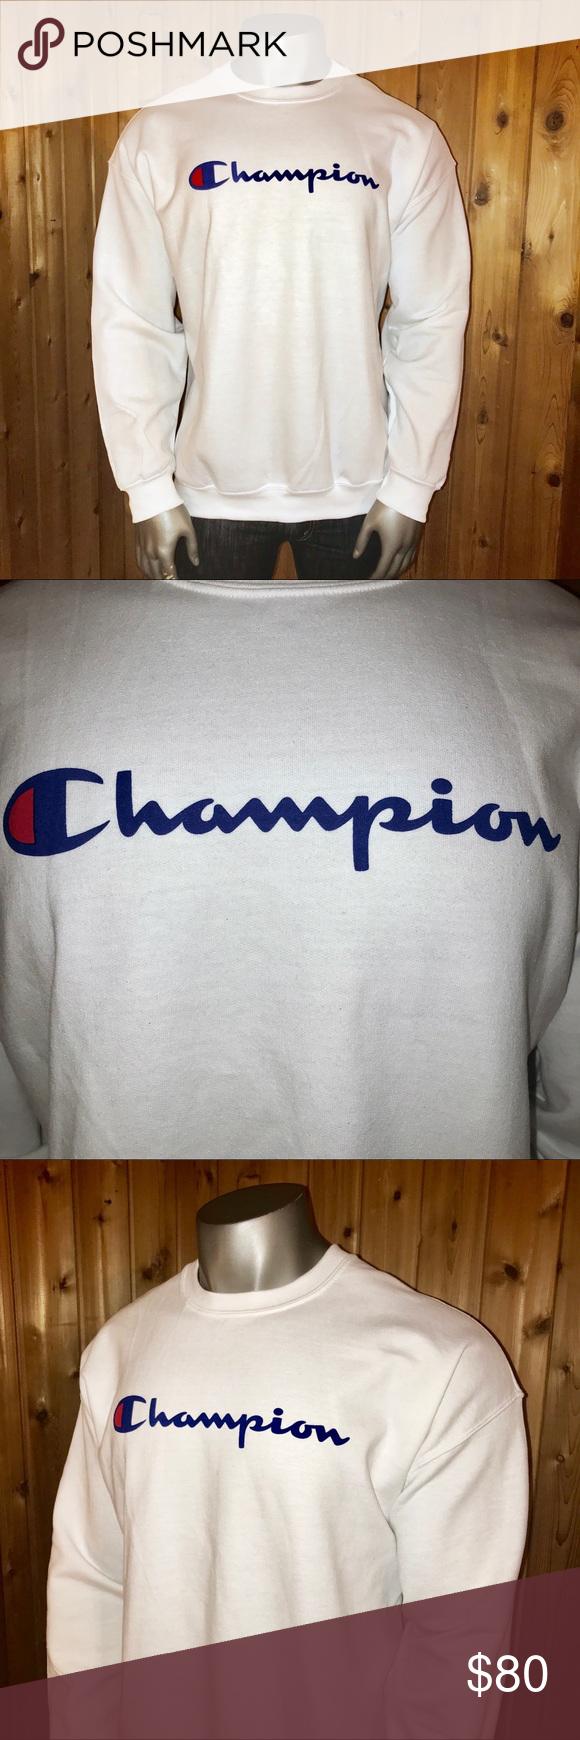 Nwt Champion Athletic Men S Xxl Sweatshirt Sweatshirts Branded Sweatshirts Champion Shirts [ 1740 x 580 Pixel ]